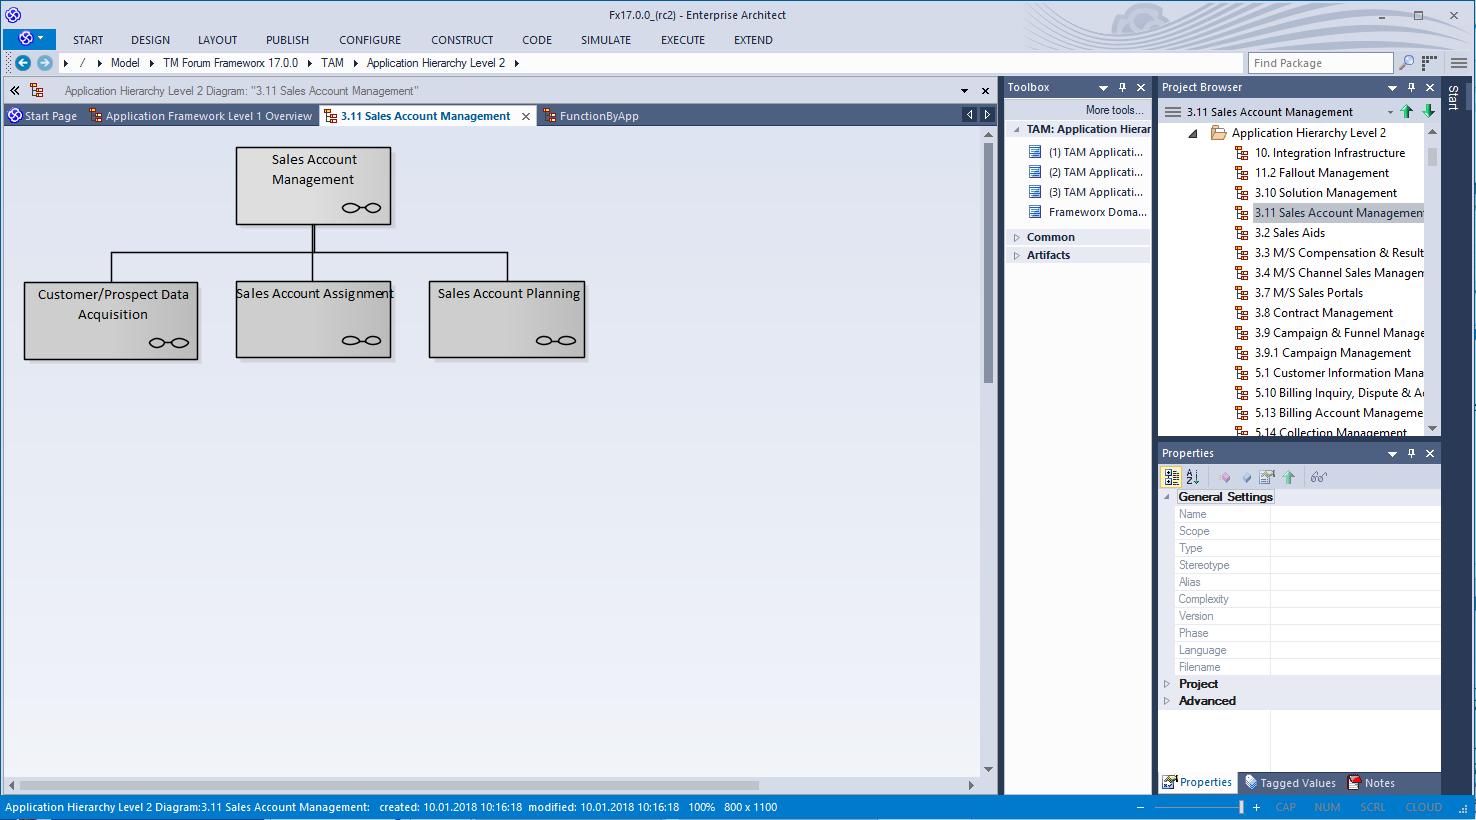 TM Forum Frameworx for Sparx Systems(tm) Enterprise